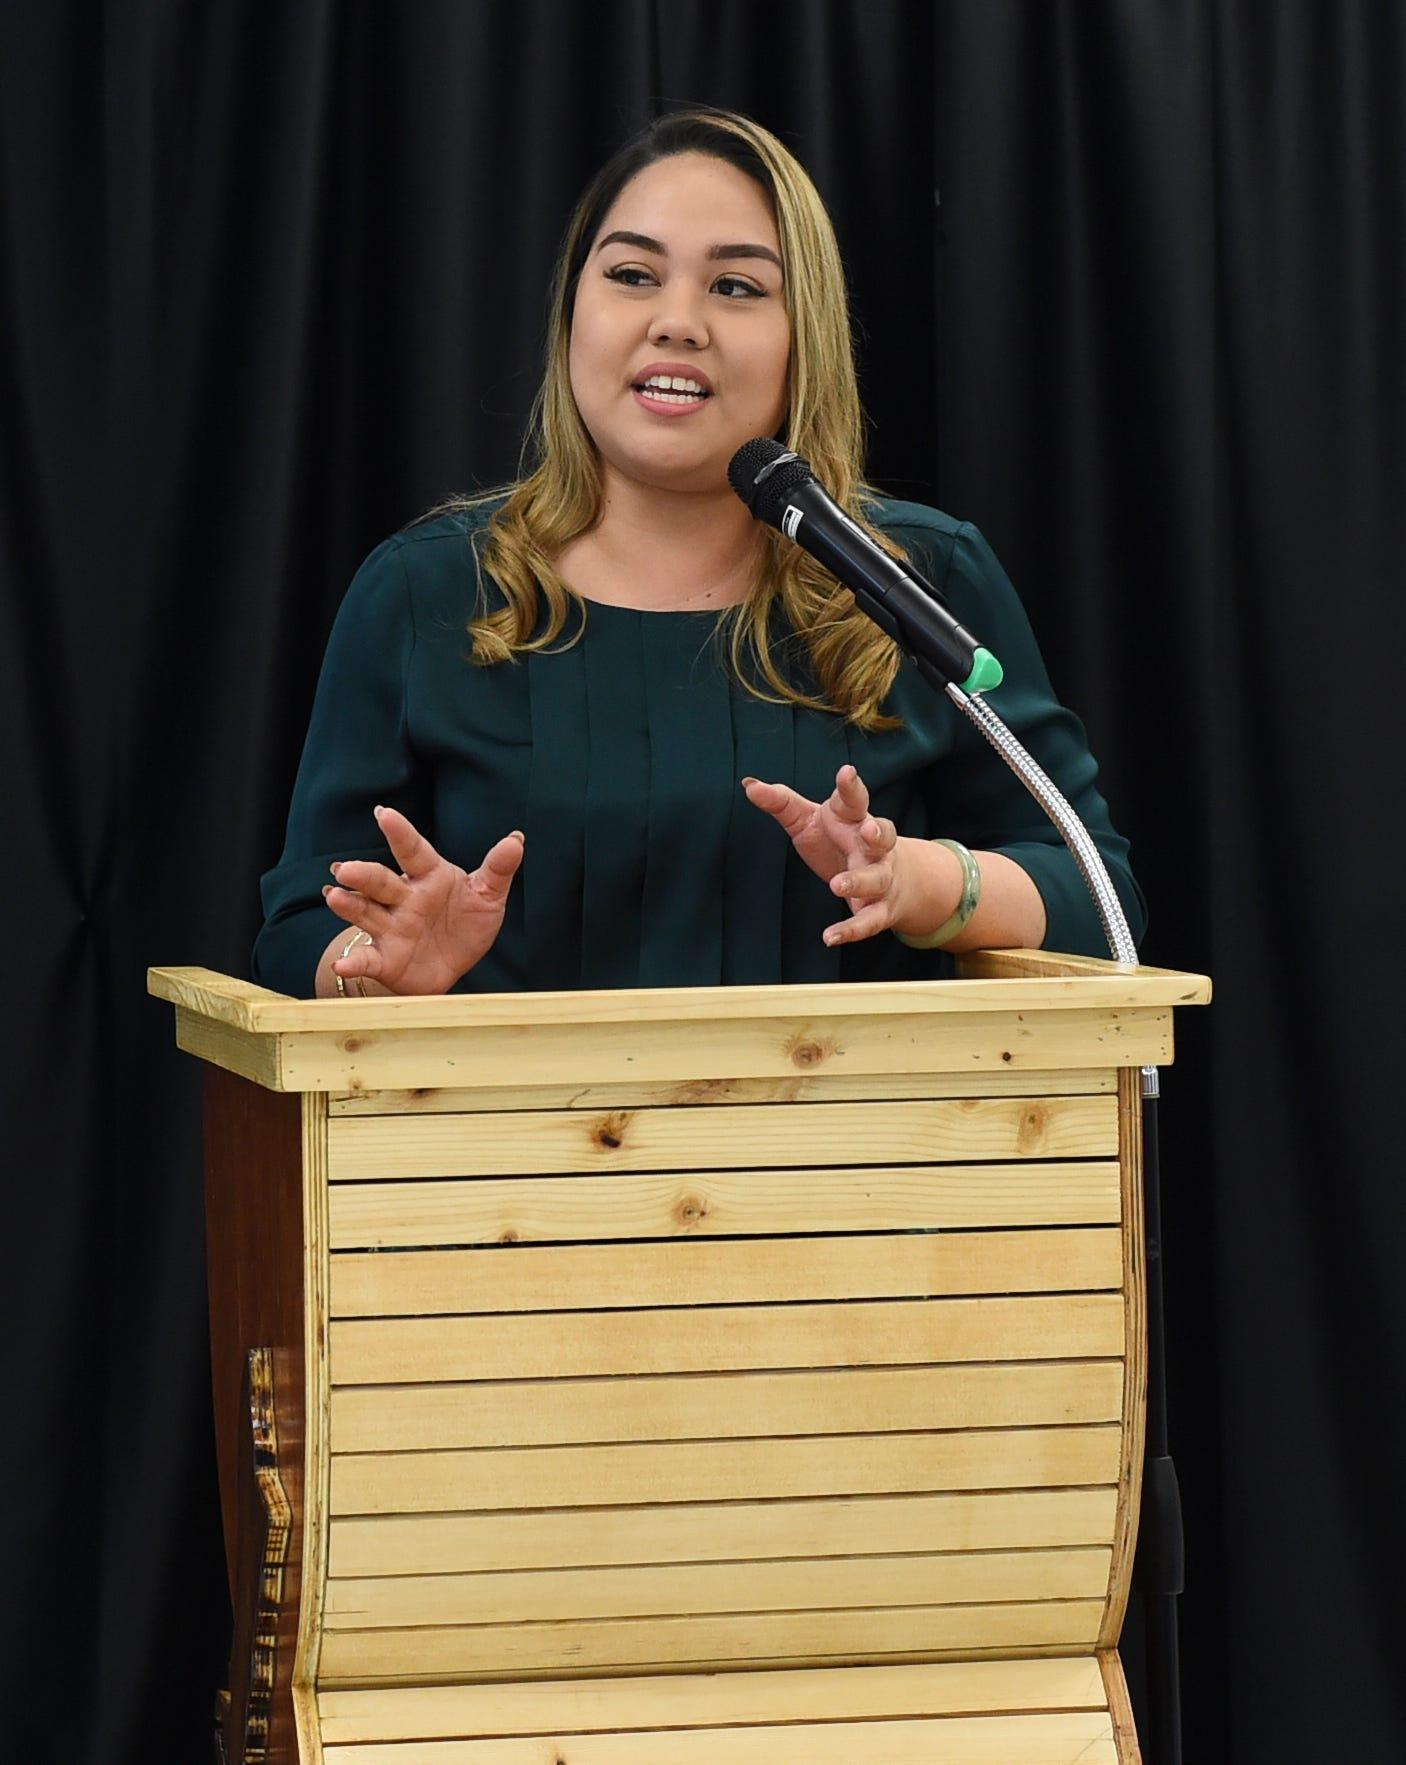 Sen. Amanda Shelton during the Guam Community College Ship Repair Transportation Boot Camp ll Completion Ceremony at GCC in Mangilao, Dec. 20, 2019.